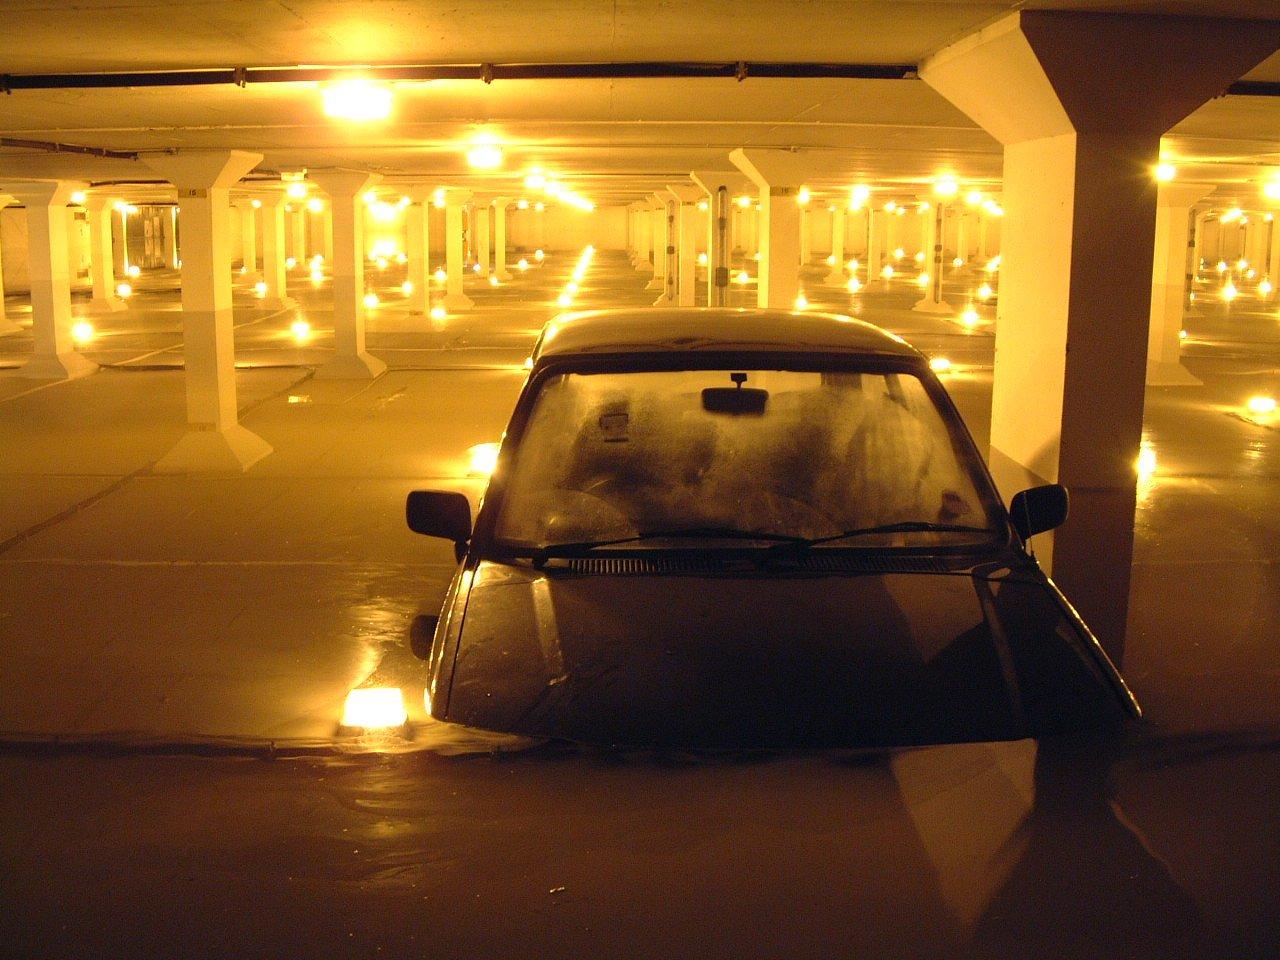 Night shot in car parking lot